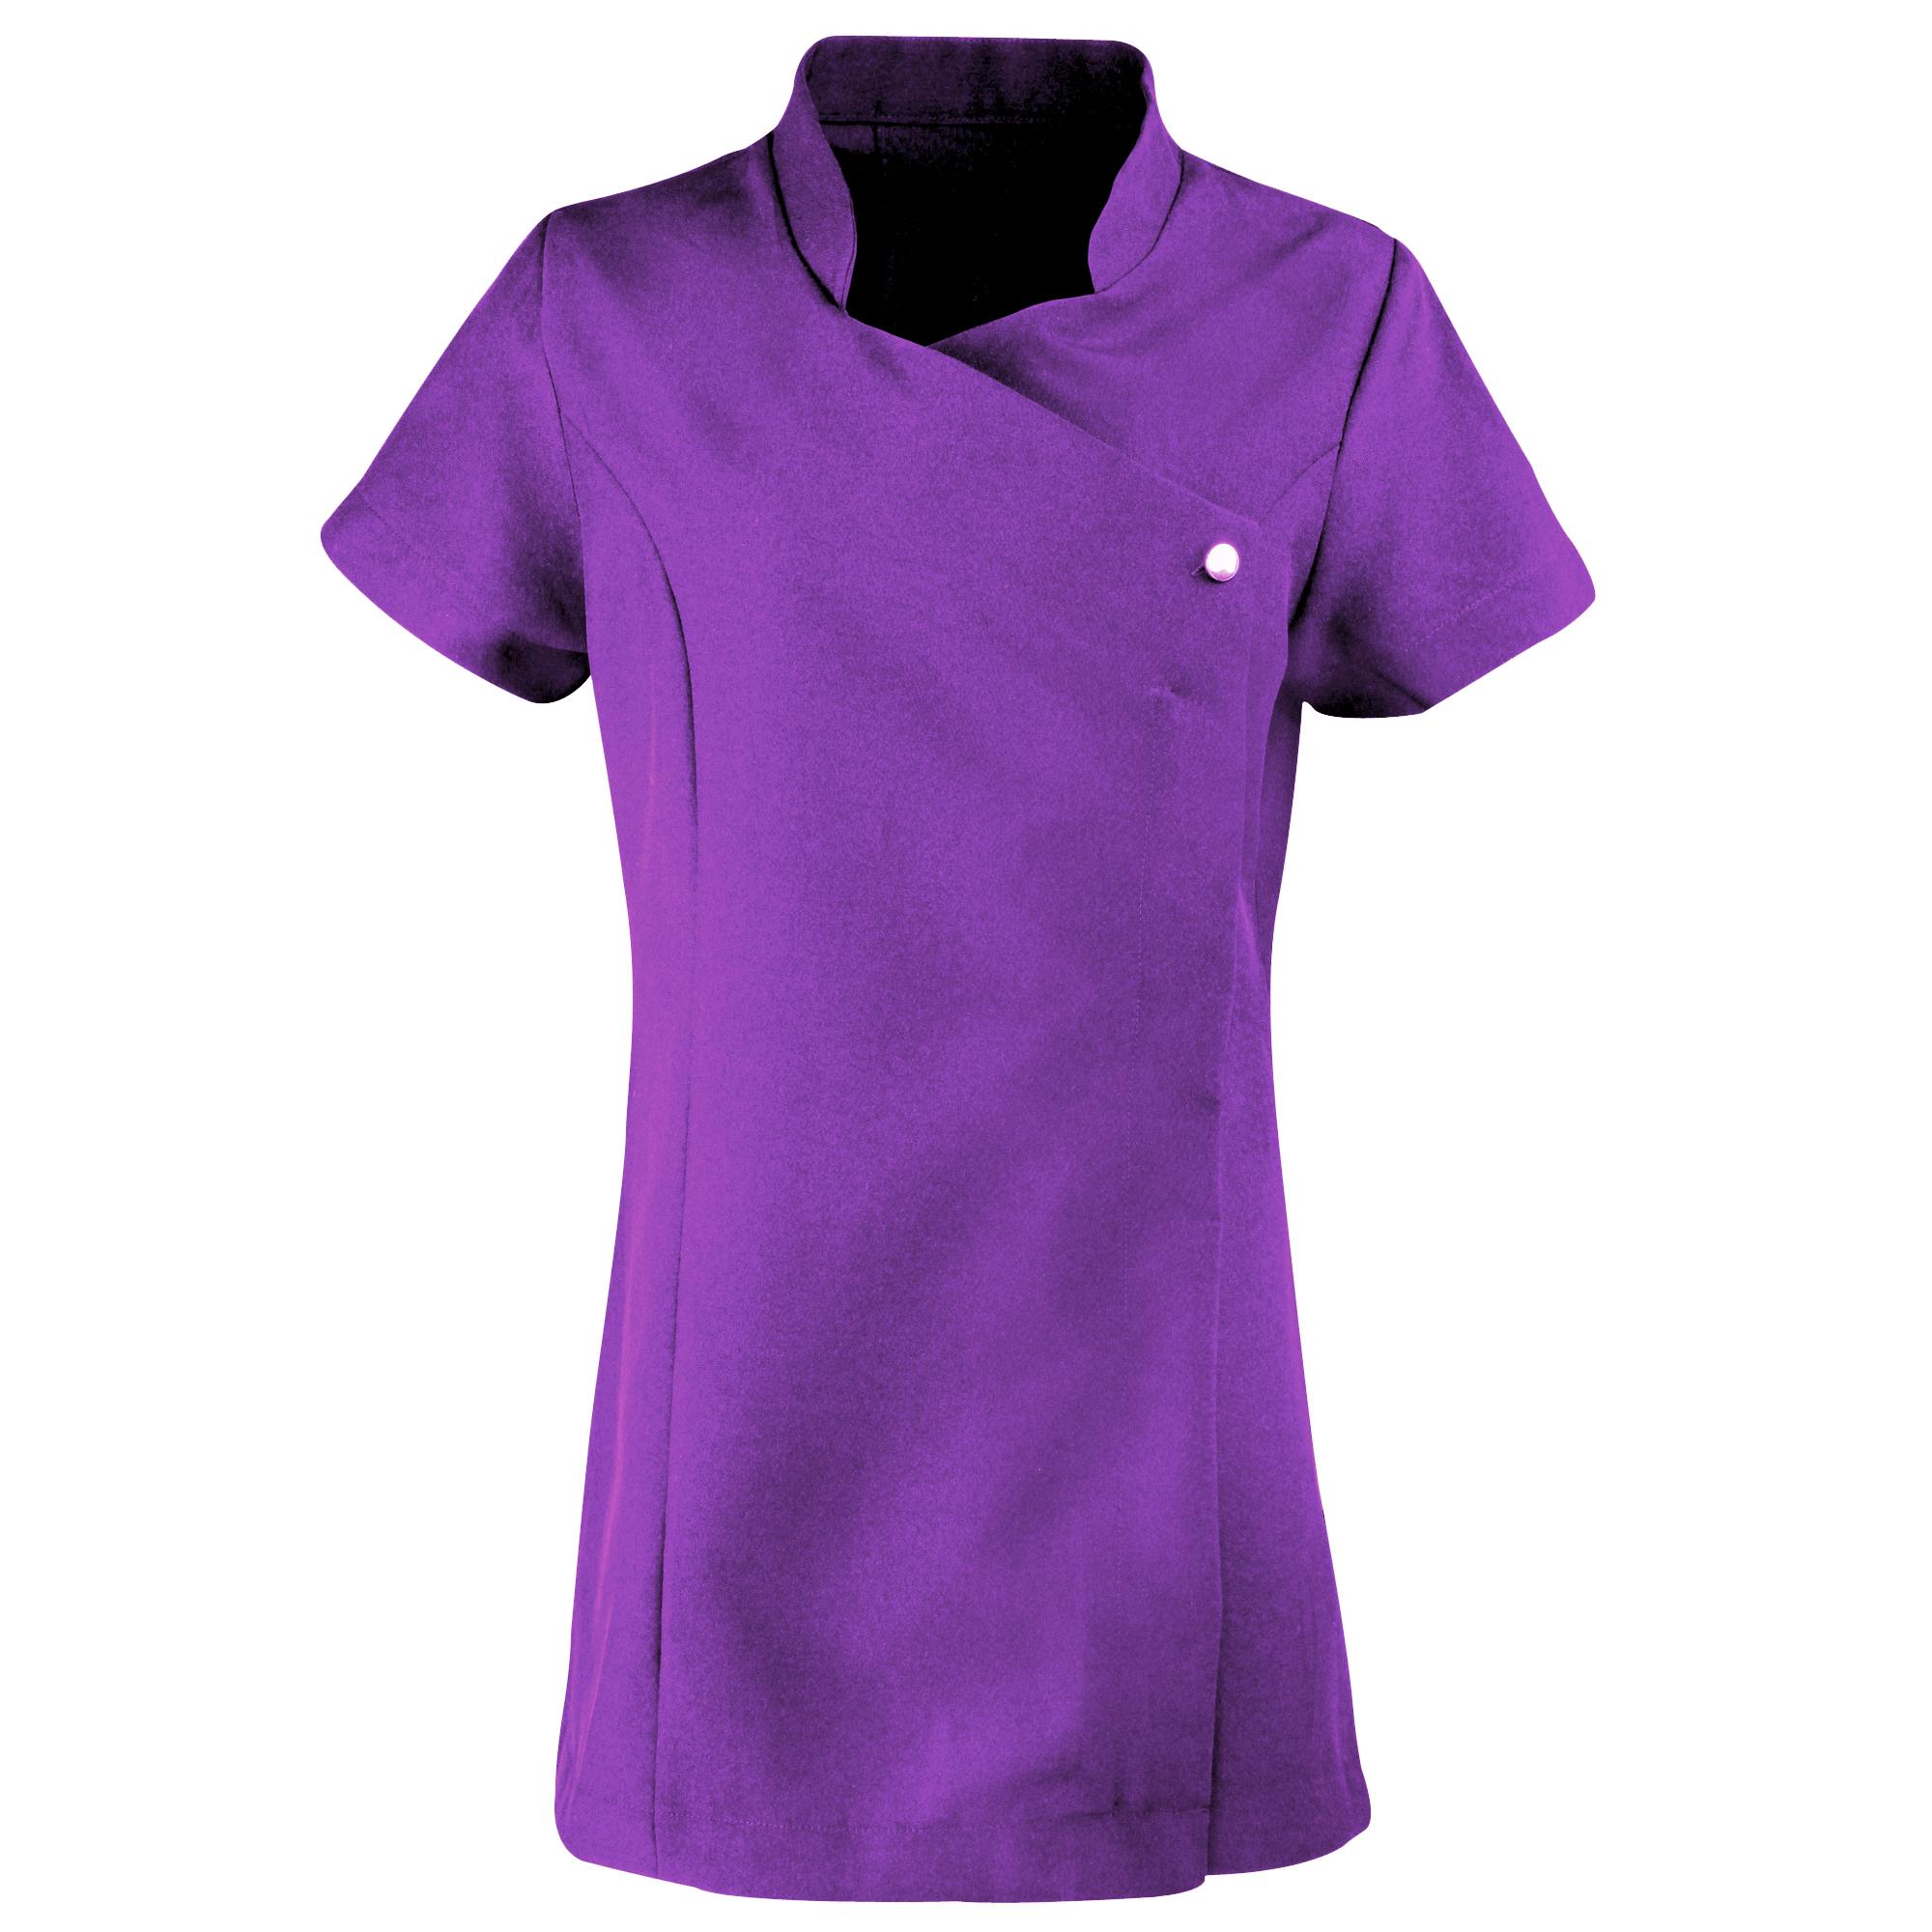 Premier Ladies/Womens *Blossom* Tunic / Health Beauty & Spa / Workwear (Pack of 2) (6) (Purple)